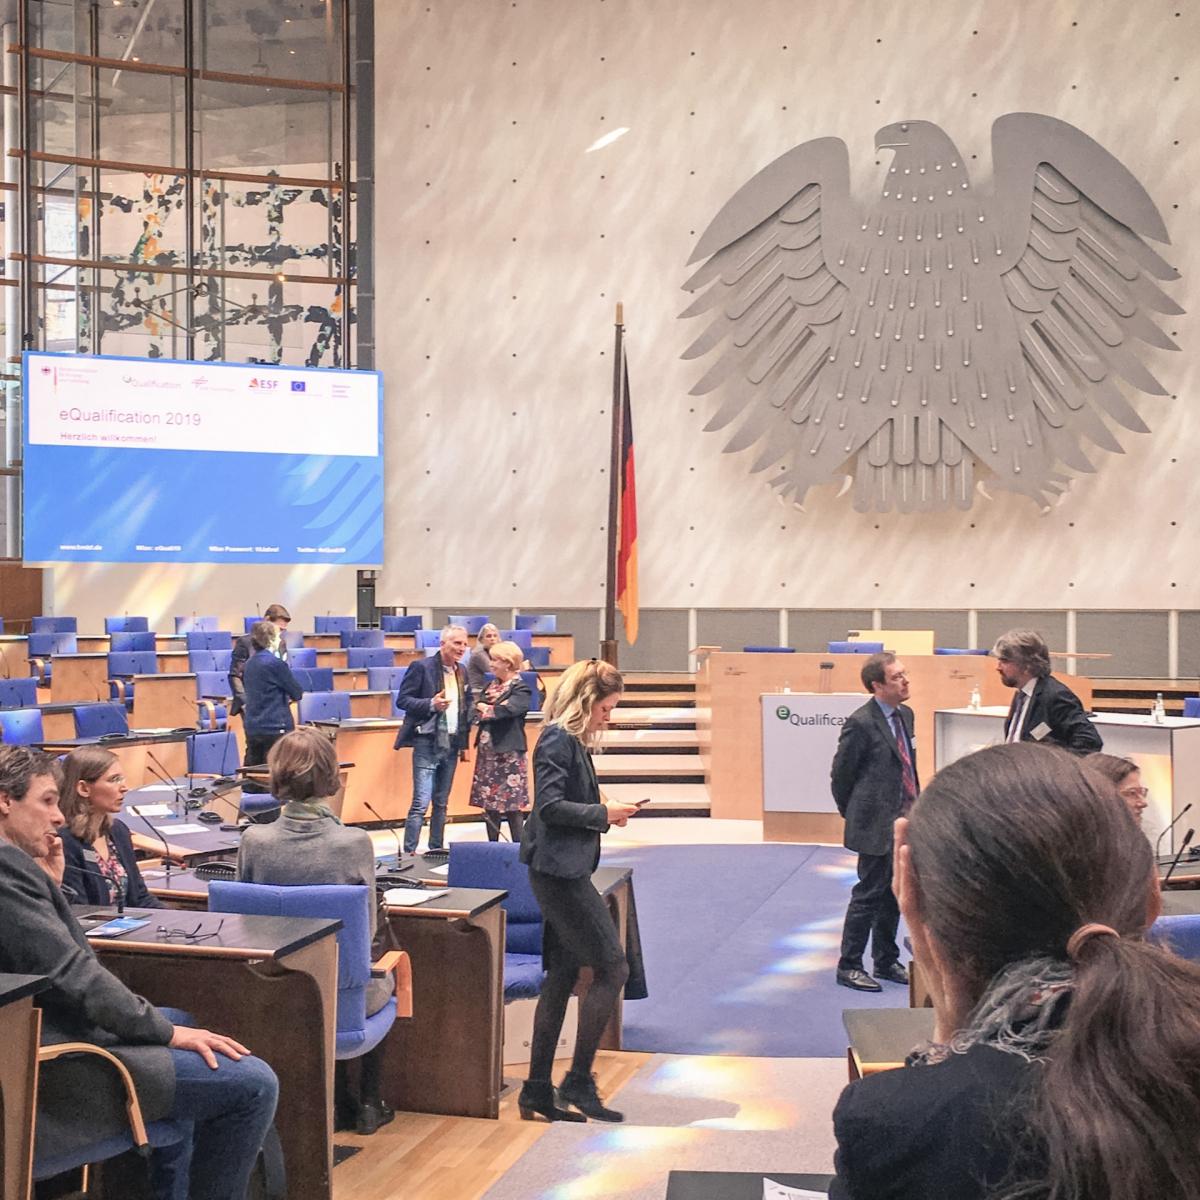 Plenarsaal, Teilnehmer der eQualification 2019